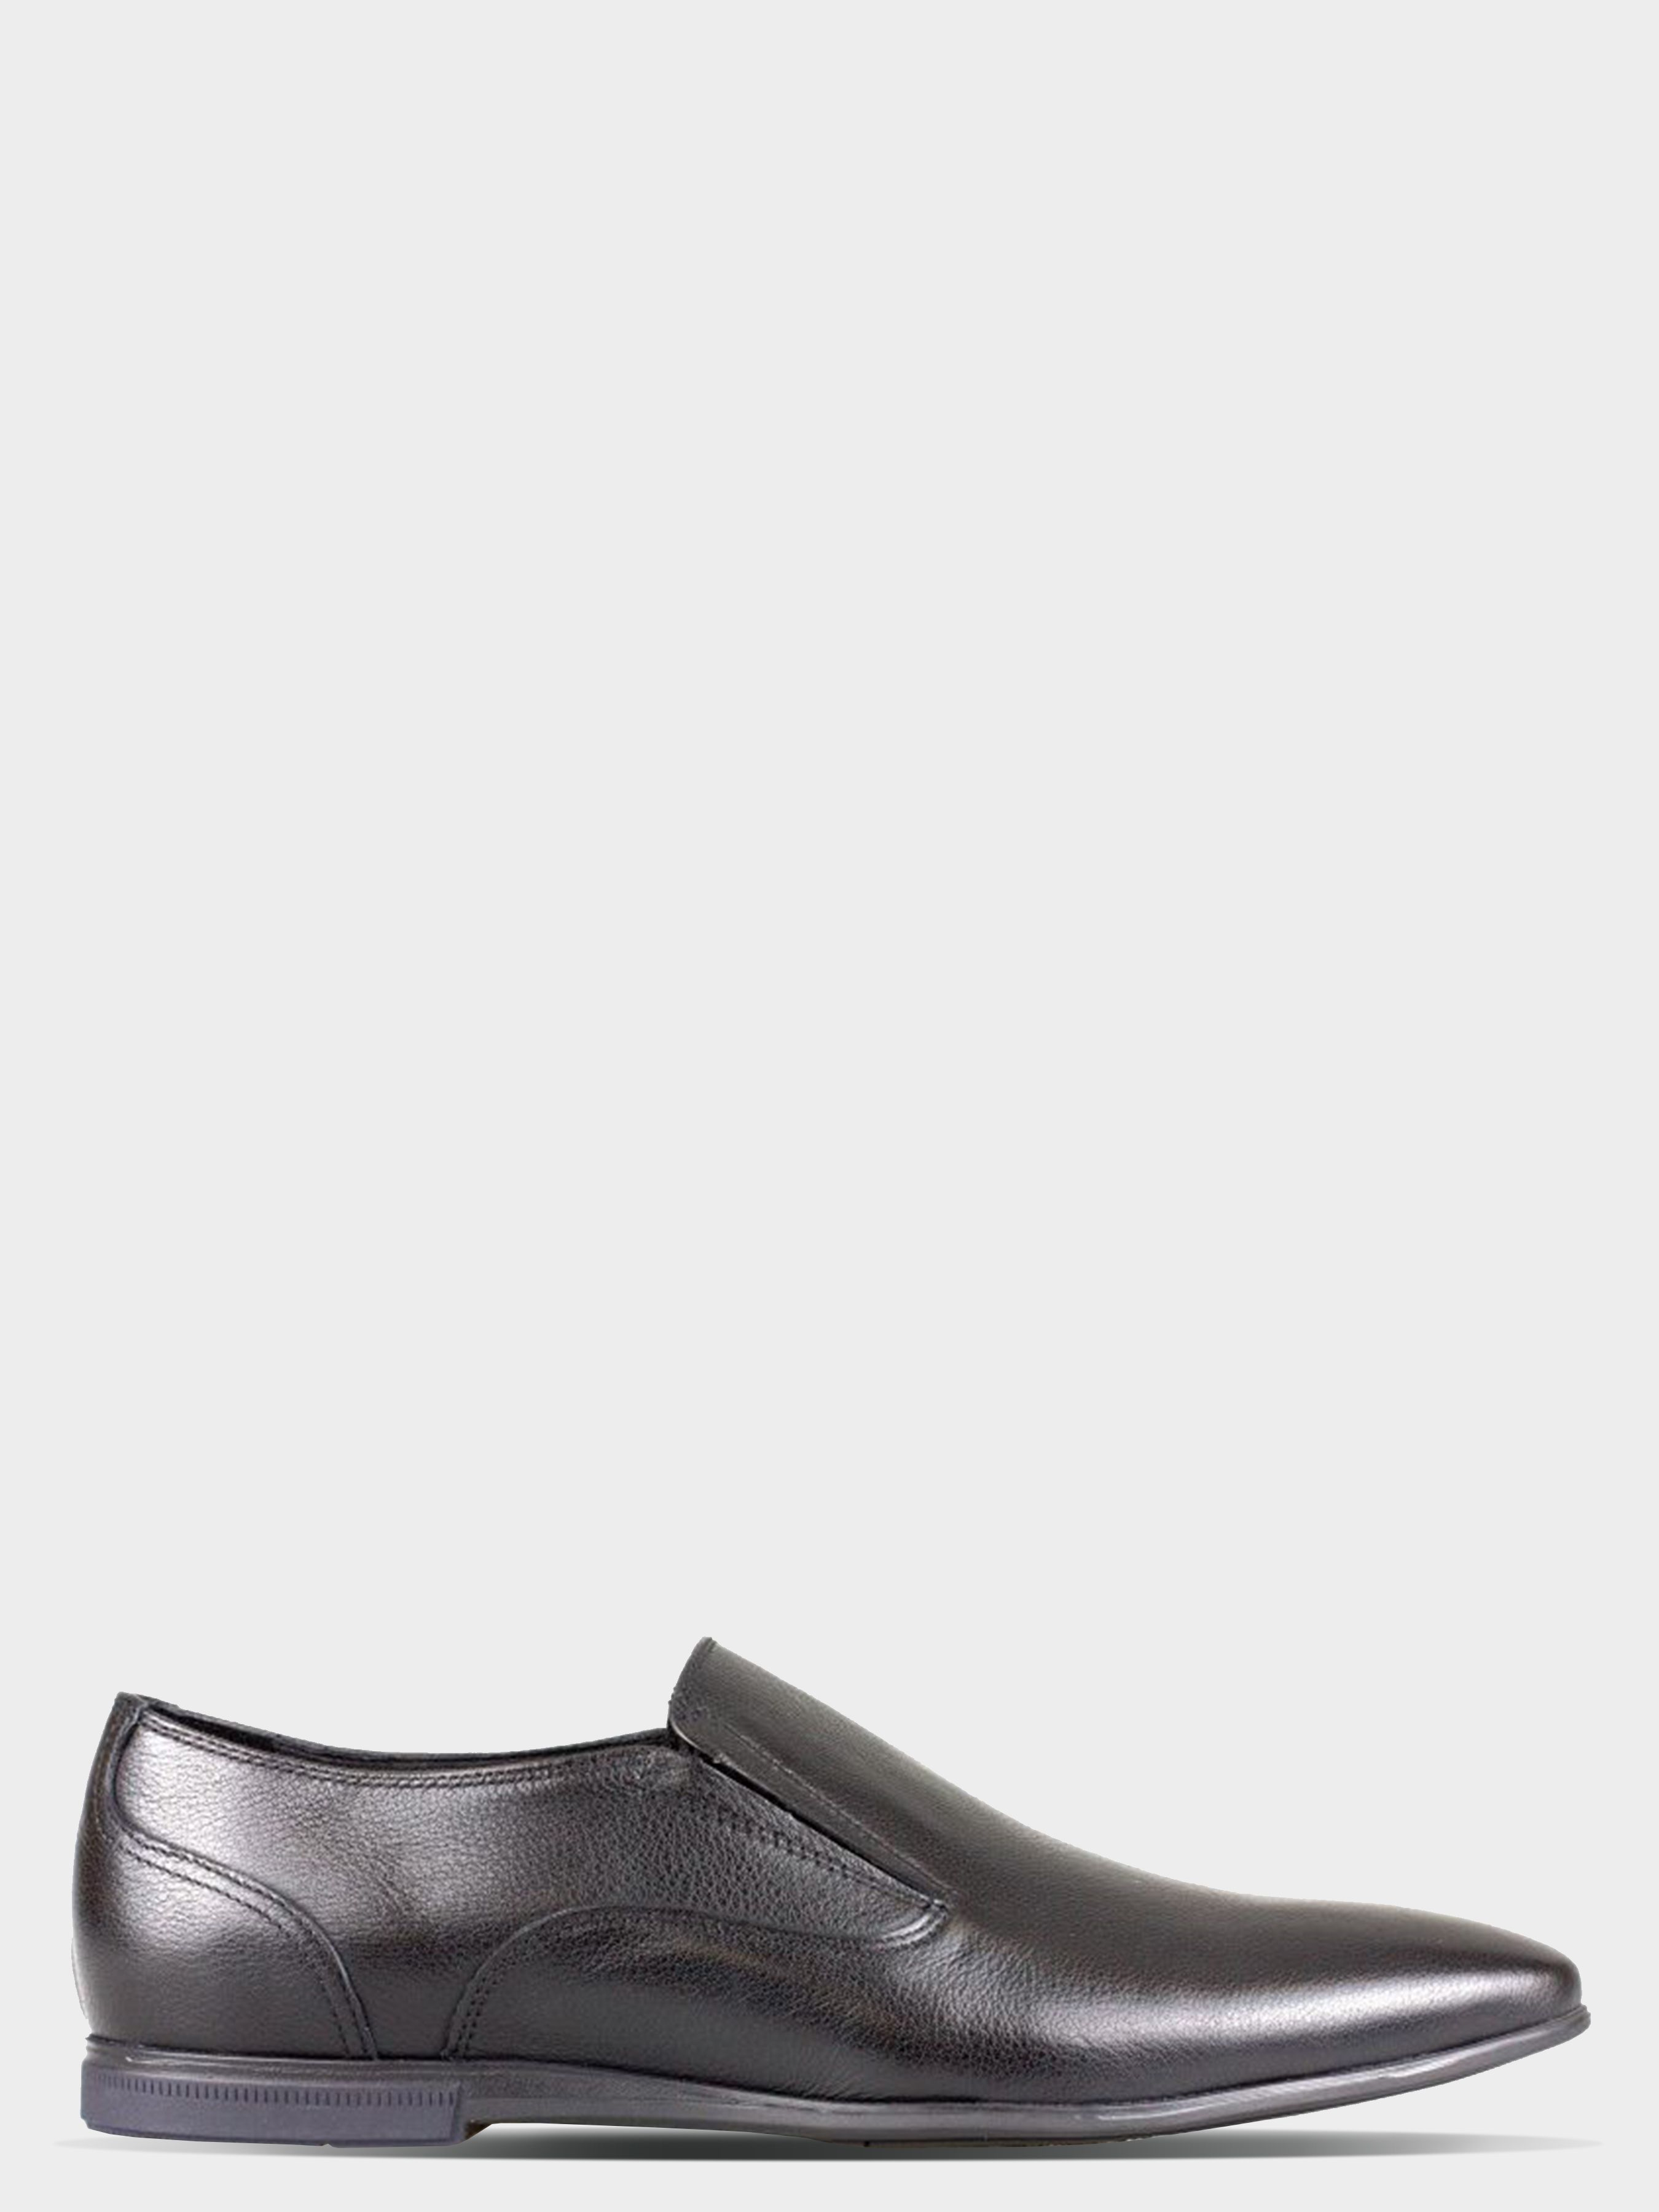 Туфли для мужчин Braska BR1508 примерка, 2017